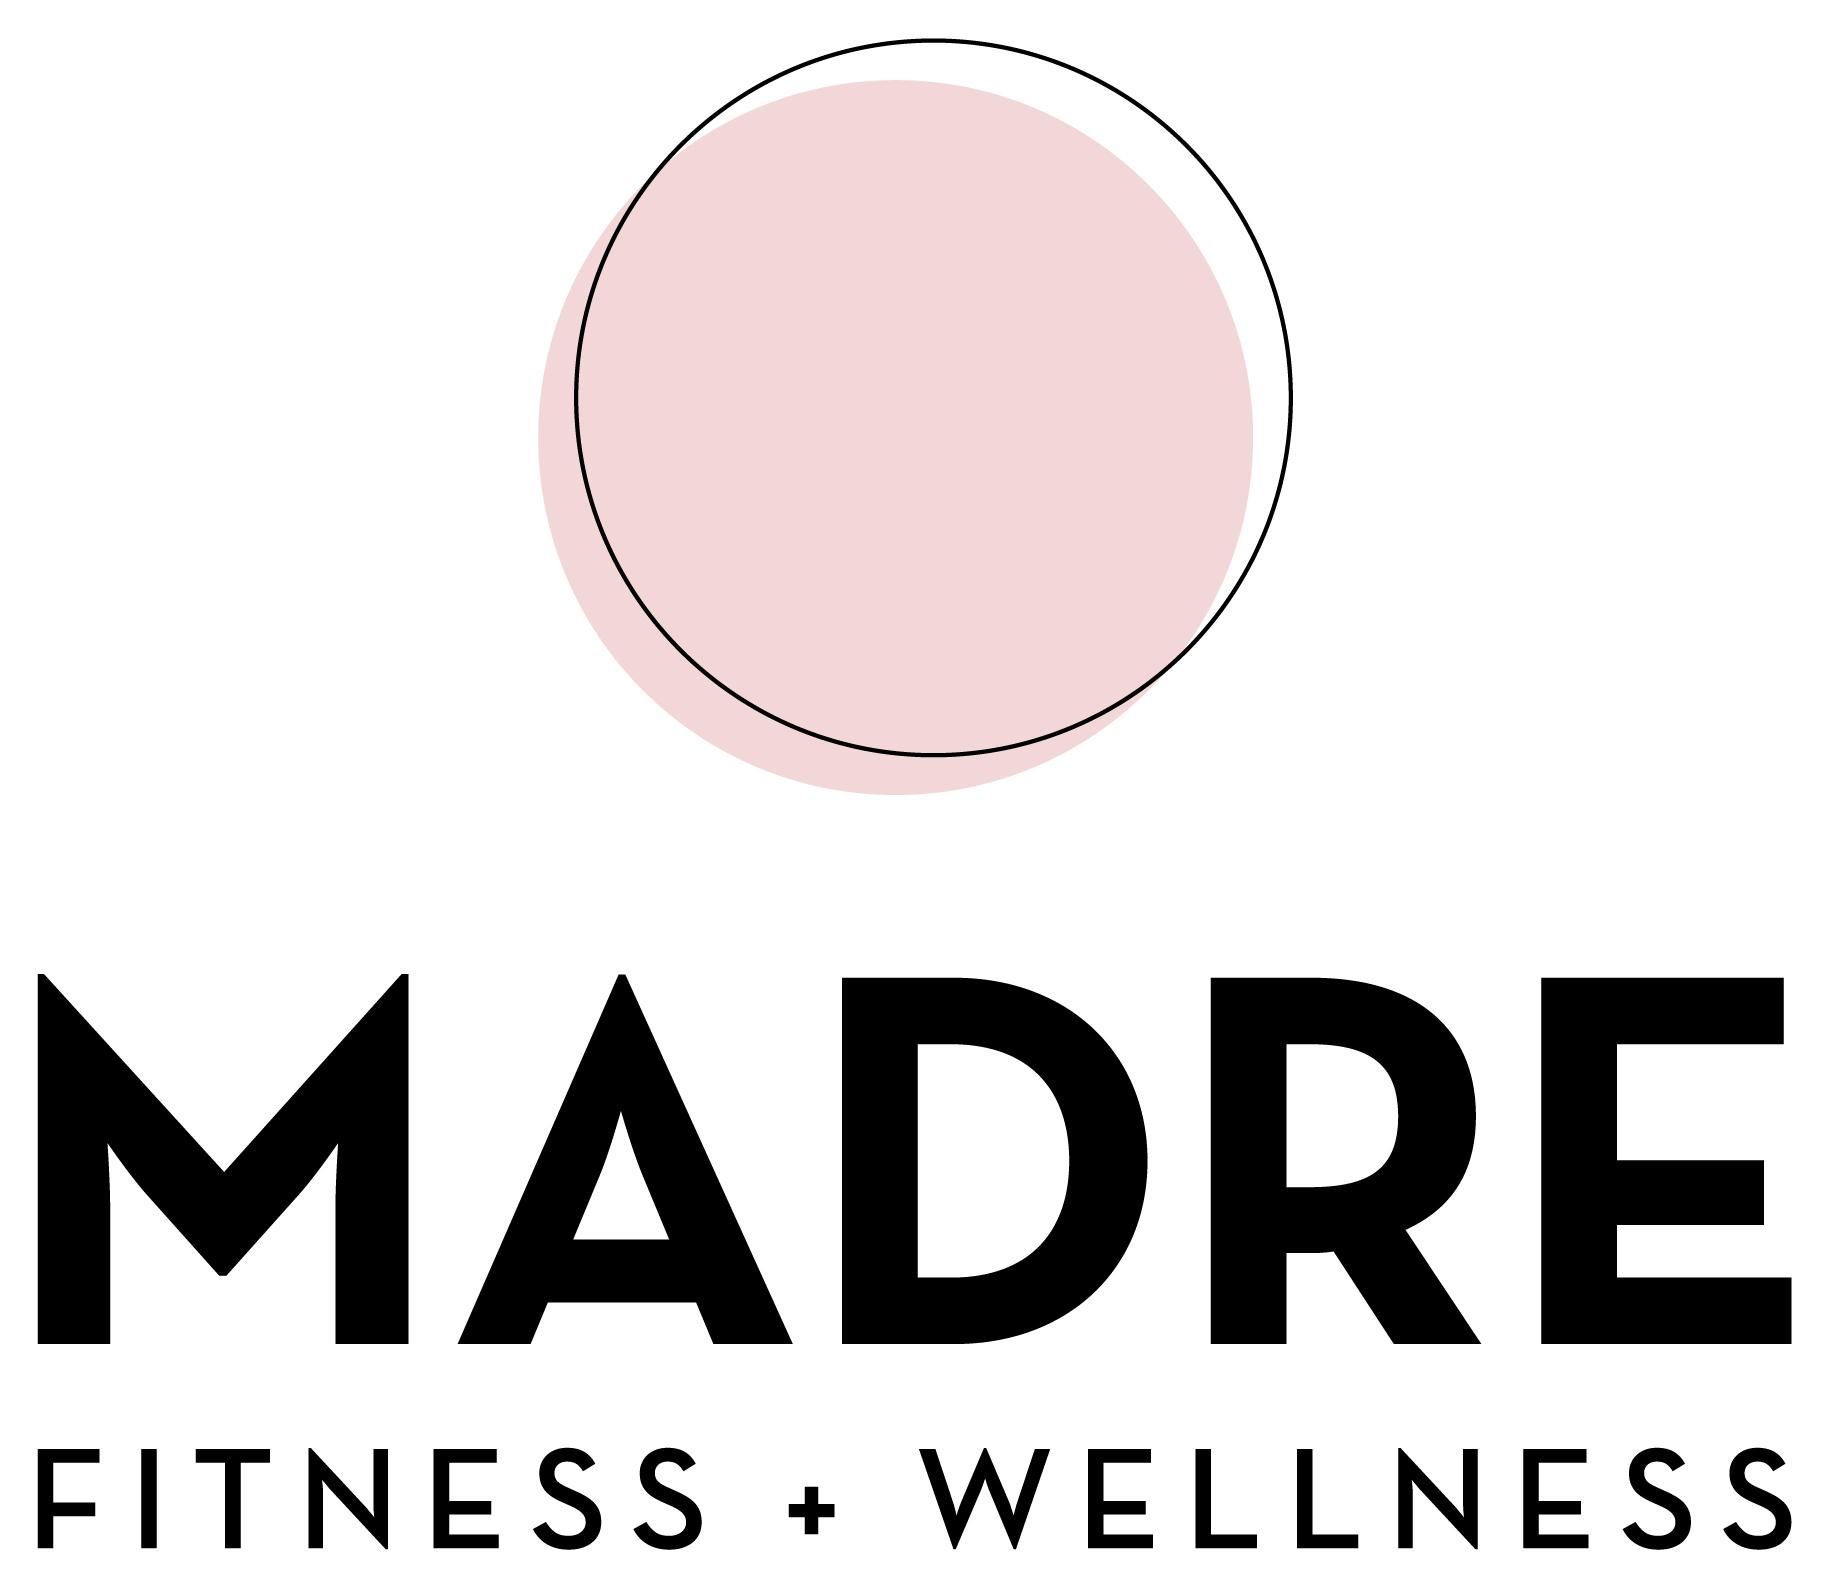 Madre-logo-FINAL-working-04.jpg